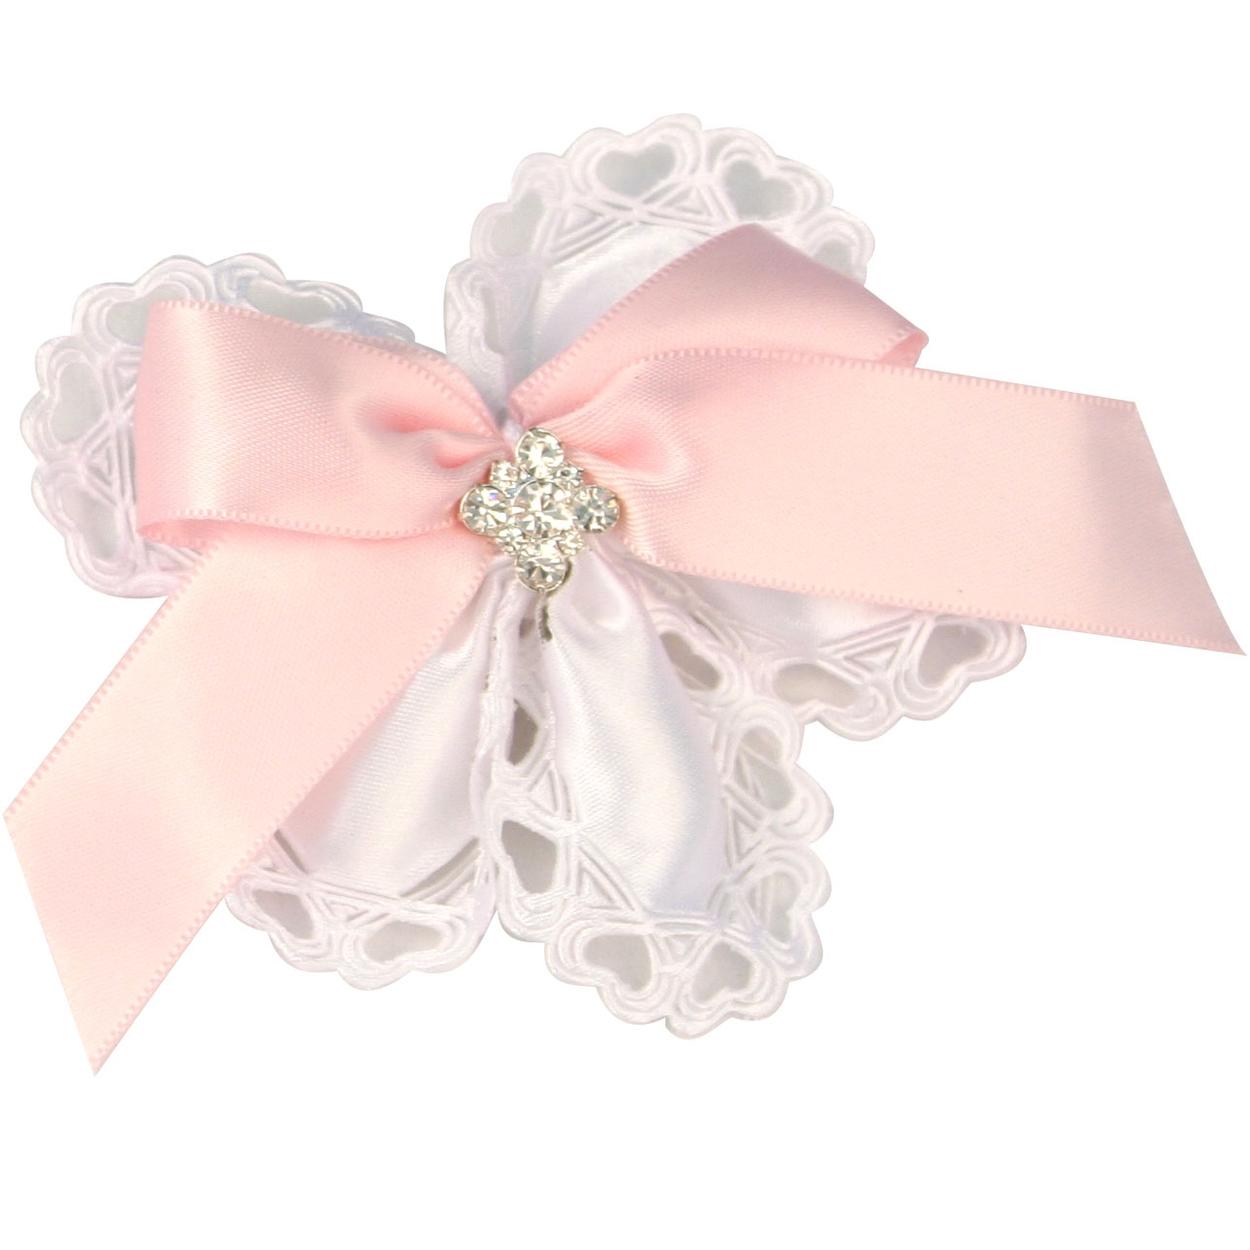 Baby Pink Jordan Almond Flower • Jordan Almonds Candy • Bulk Candy ...